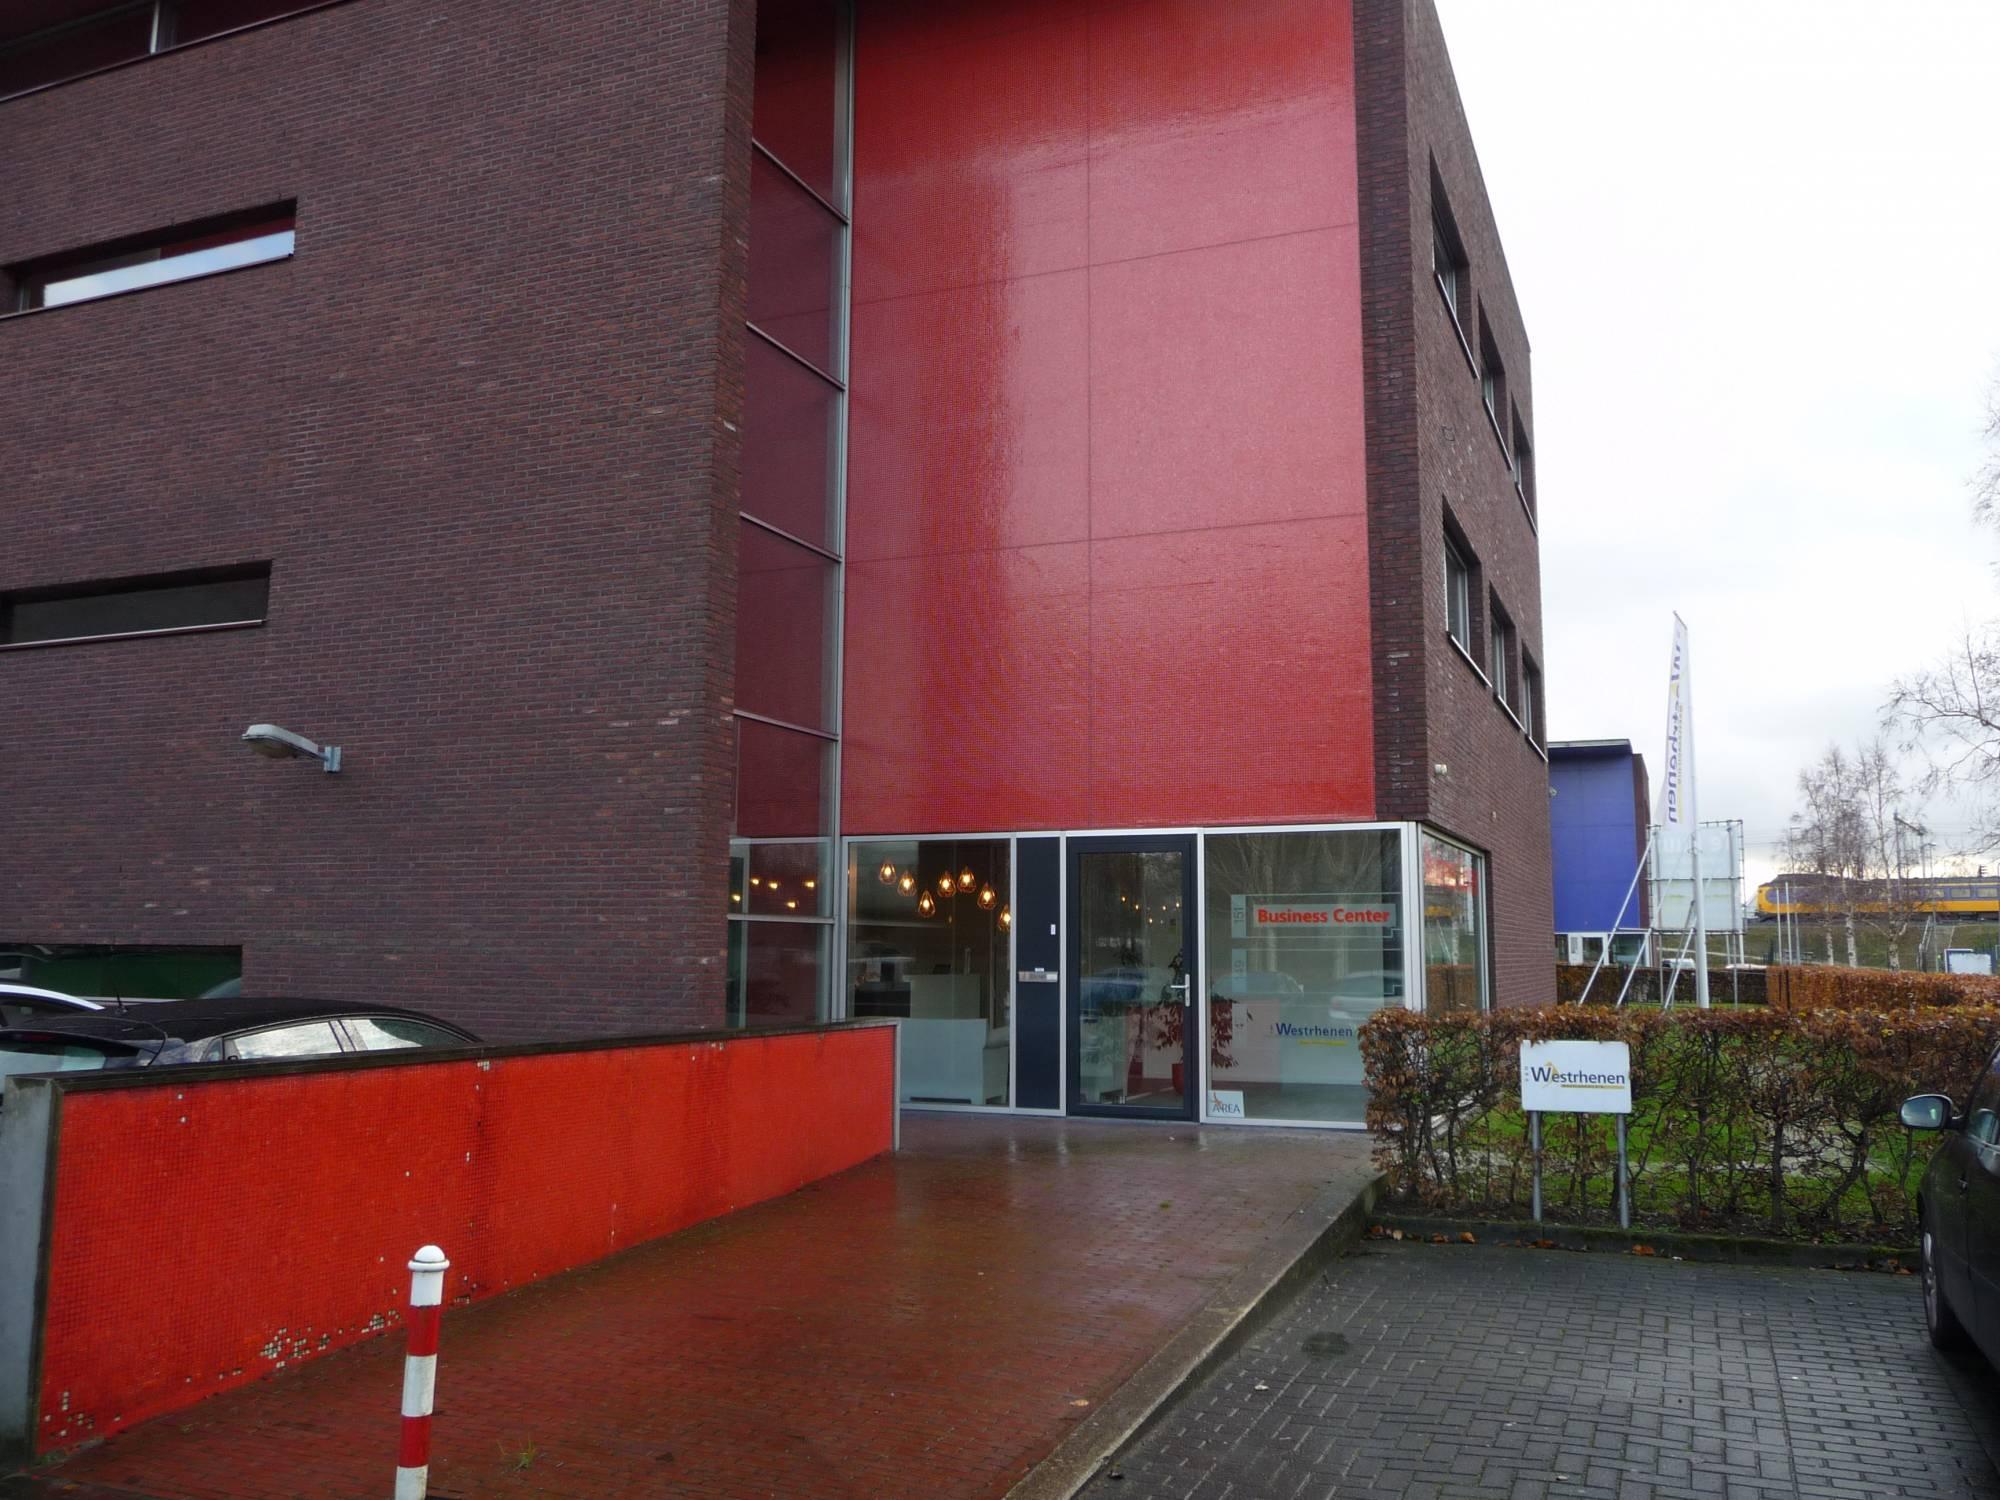 https://public.parariusoffice.nl/210/photos/huge/51432605.1532087203-622.JPG